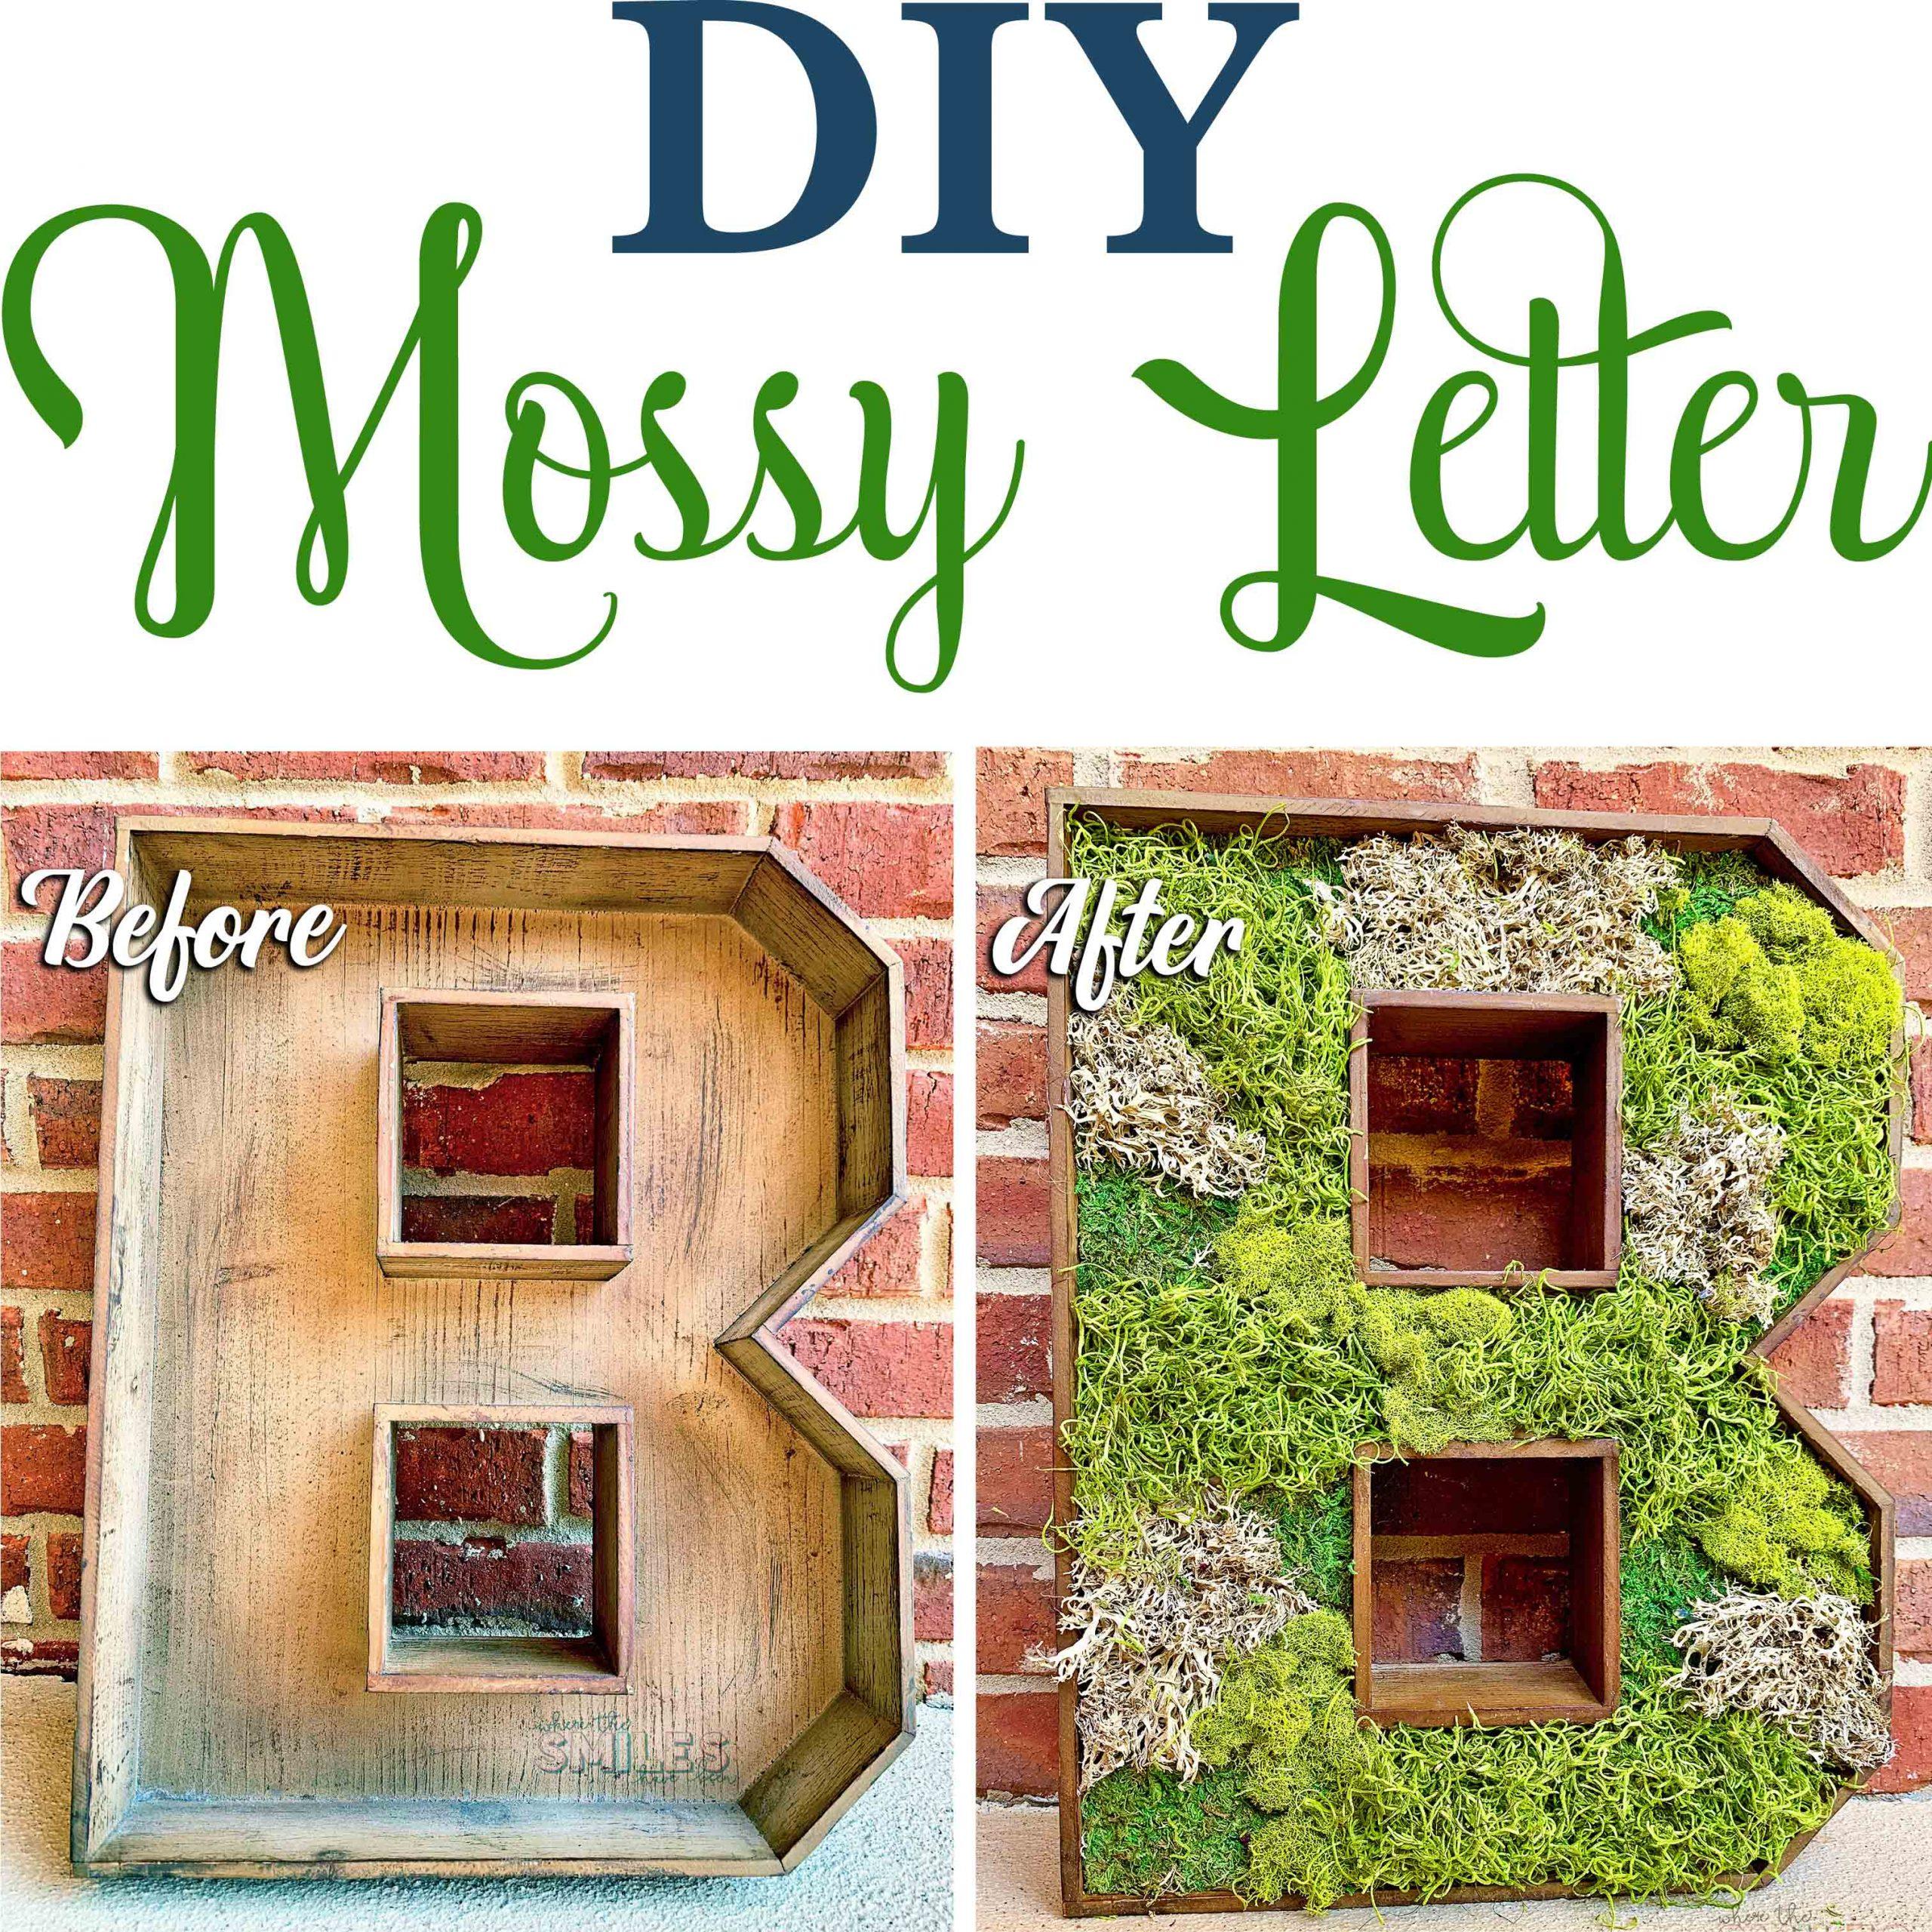 Wood Moss Letter